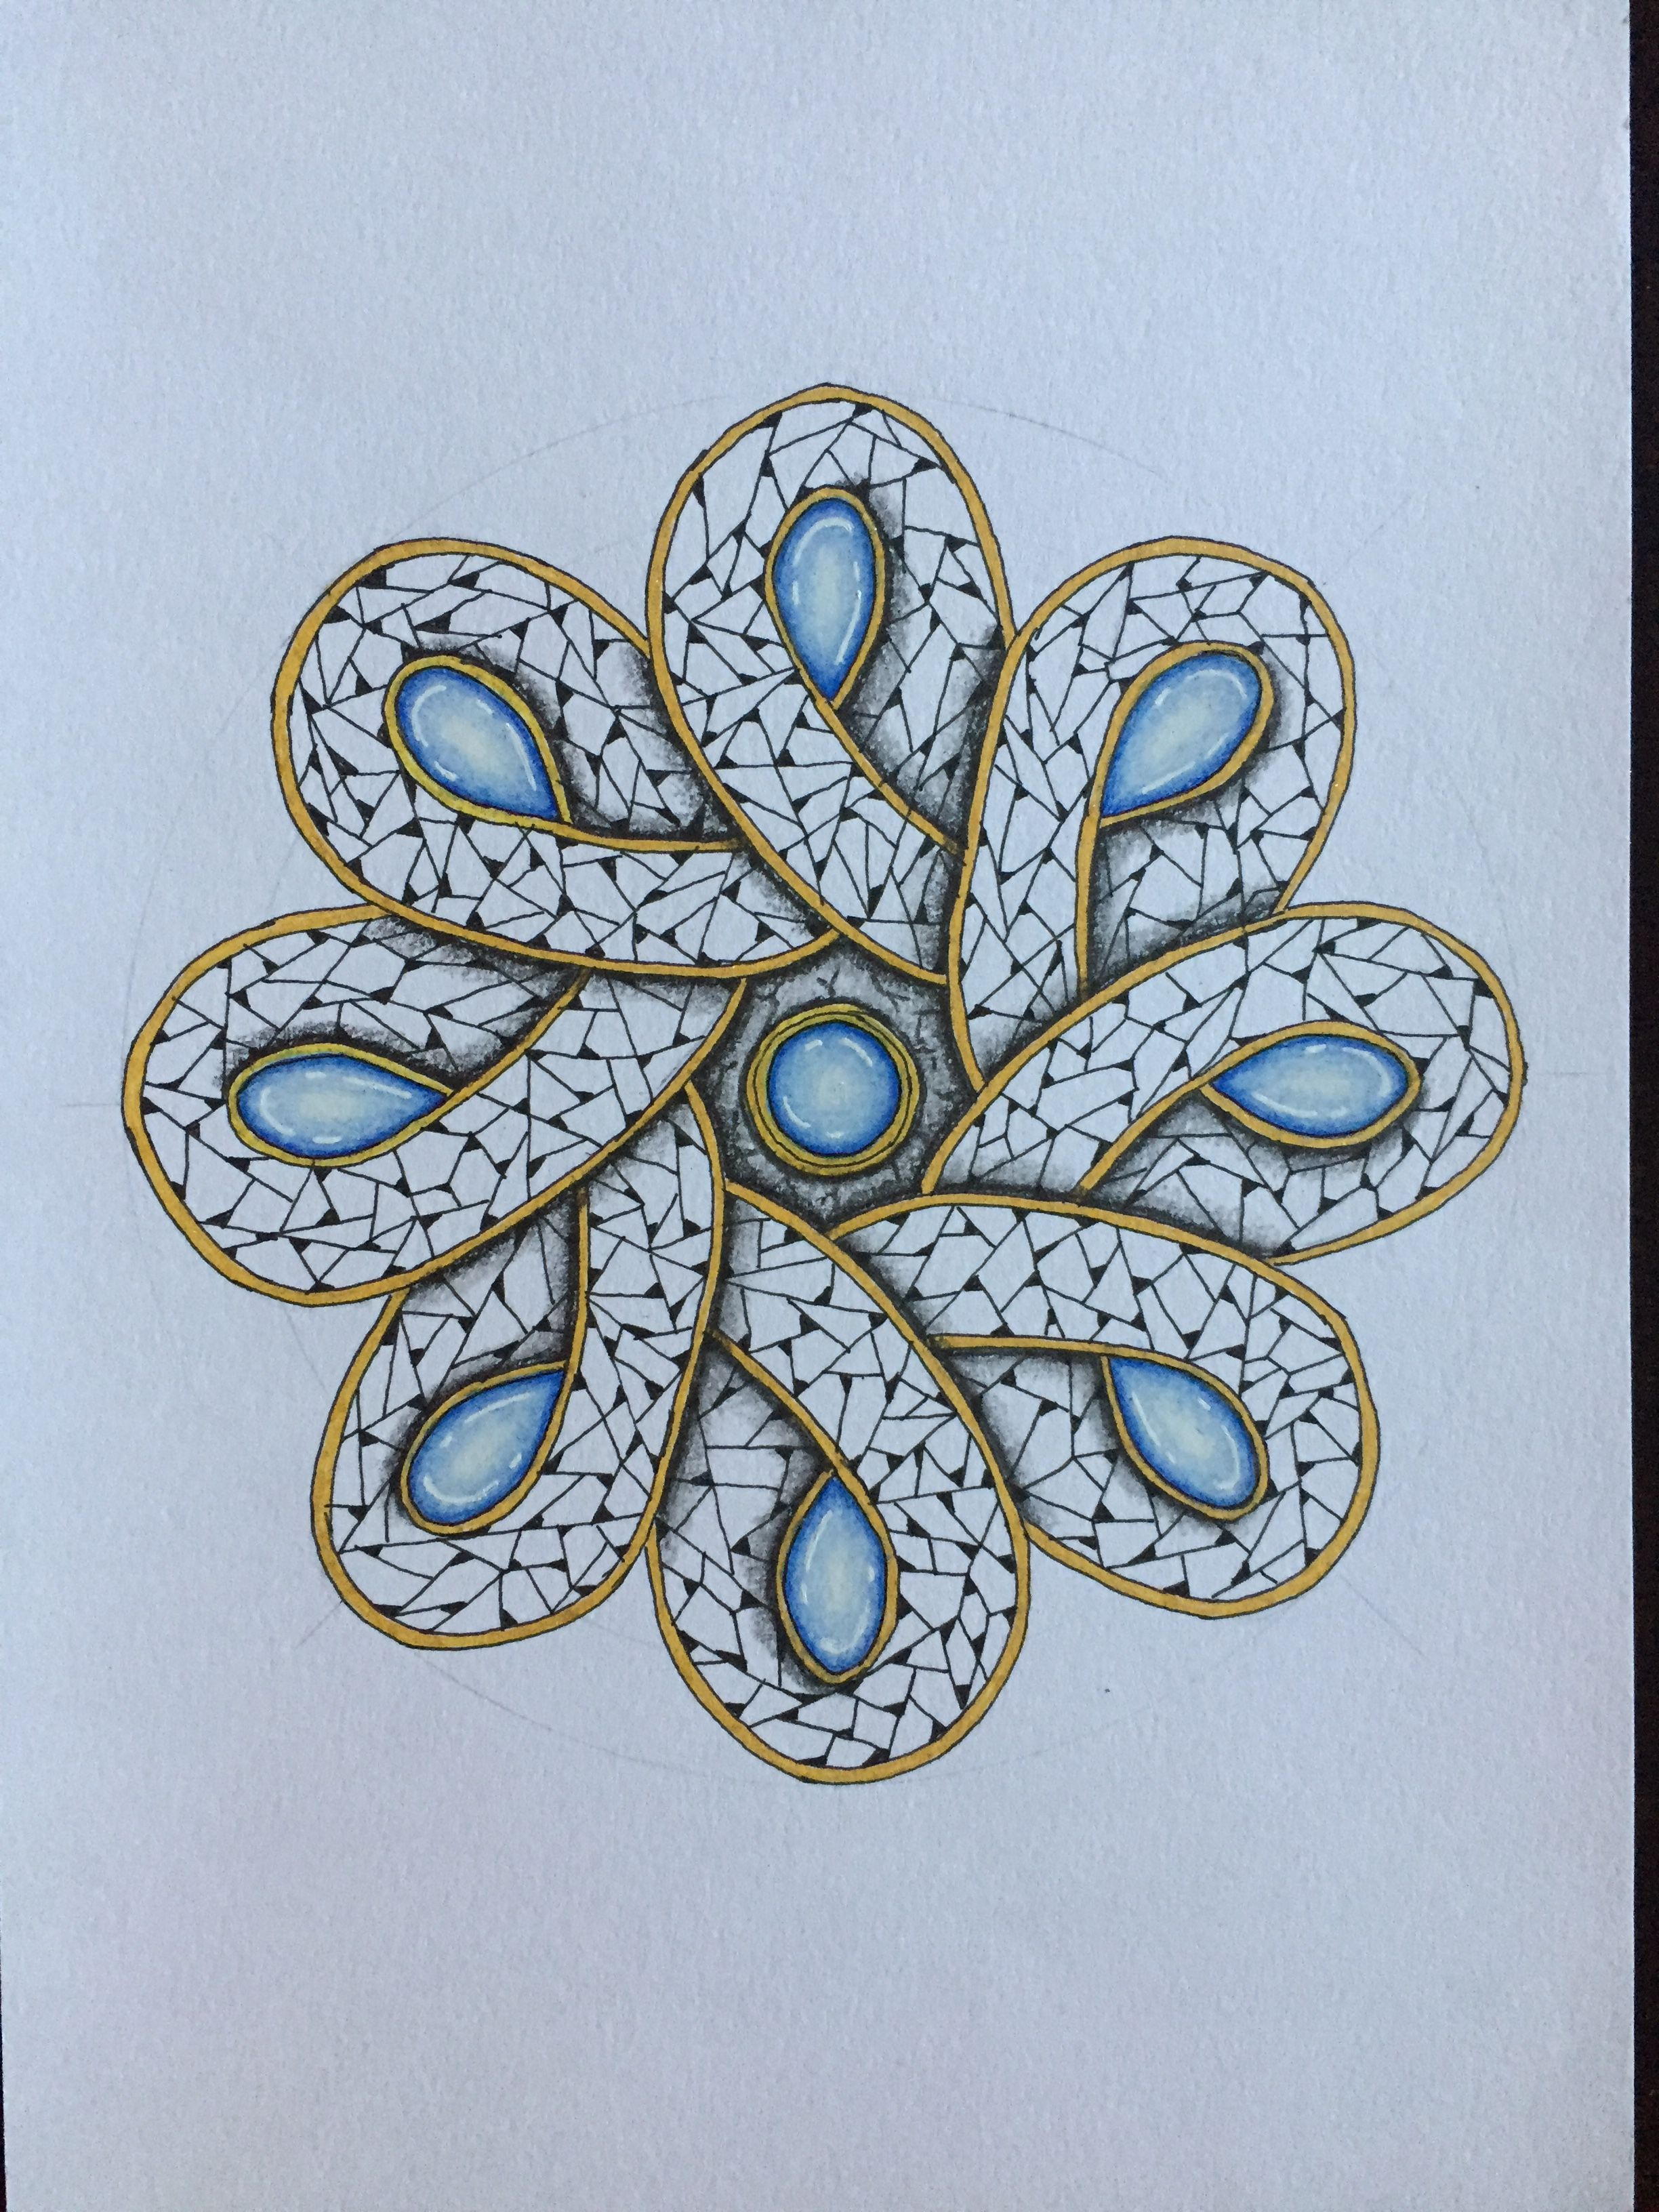 Mandala Zentangle Gems mandala zentangle gems